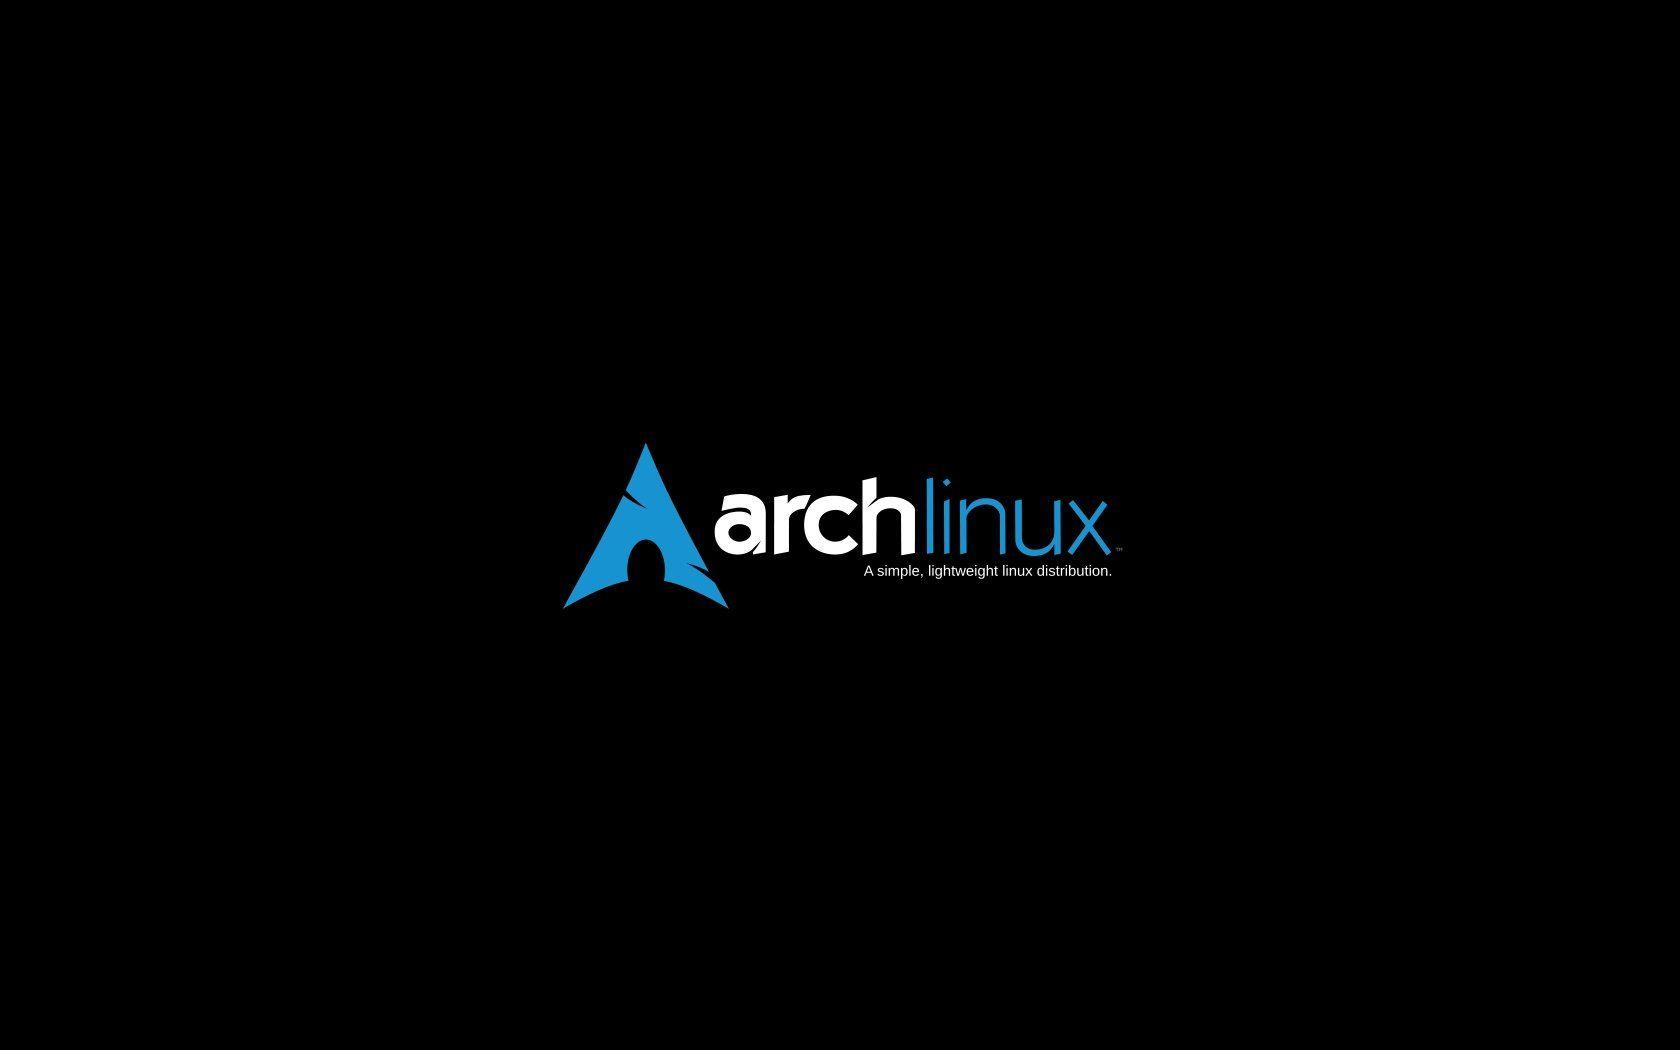 arch linux wallpaper black - photo #4